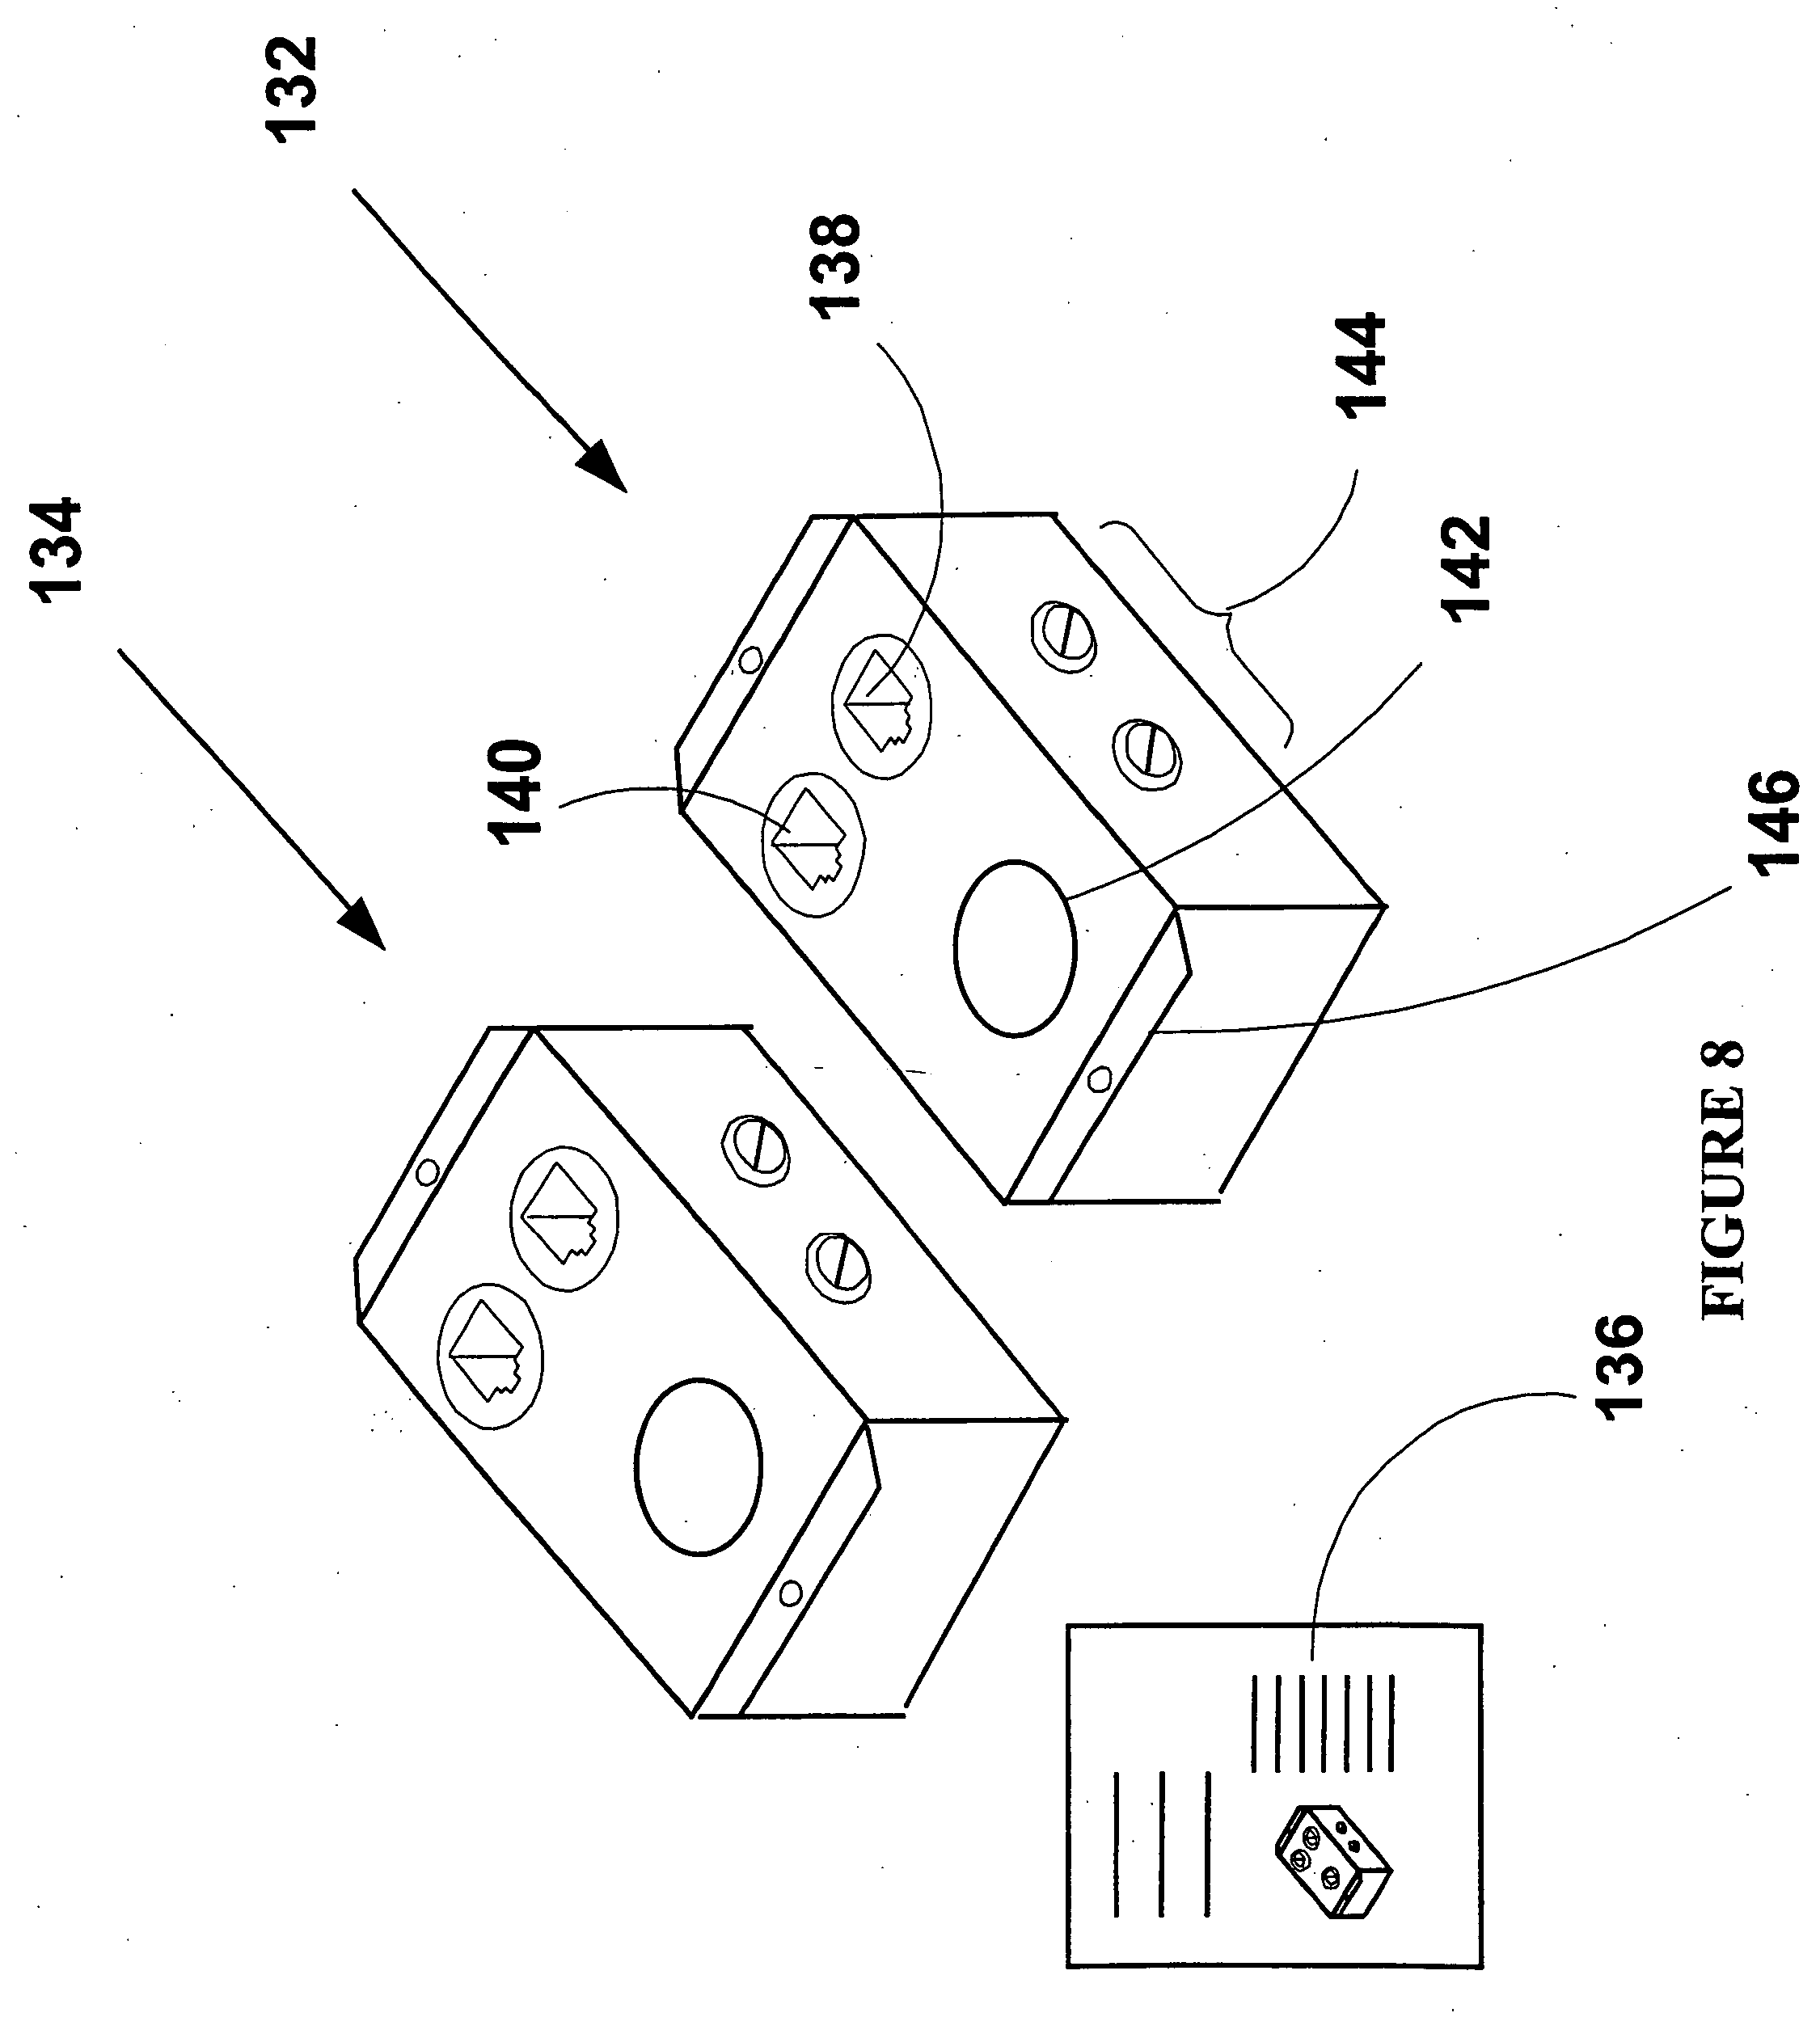 patente us20050254516